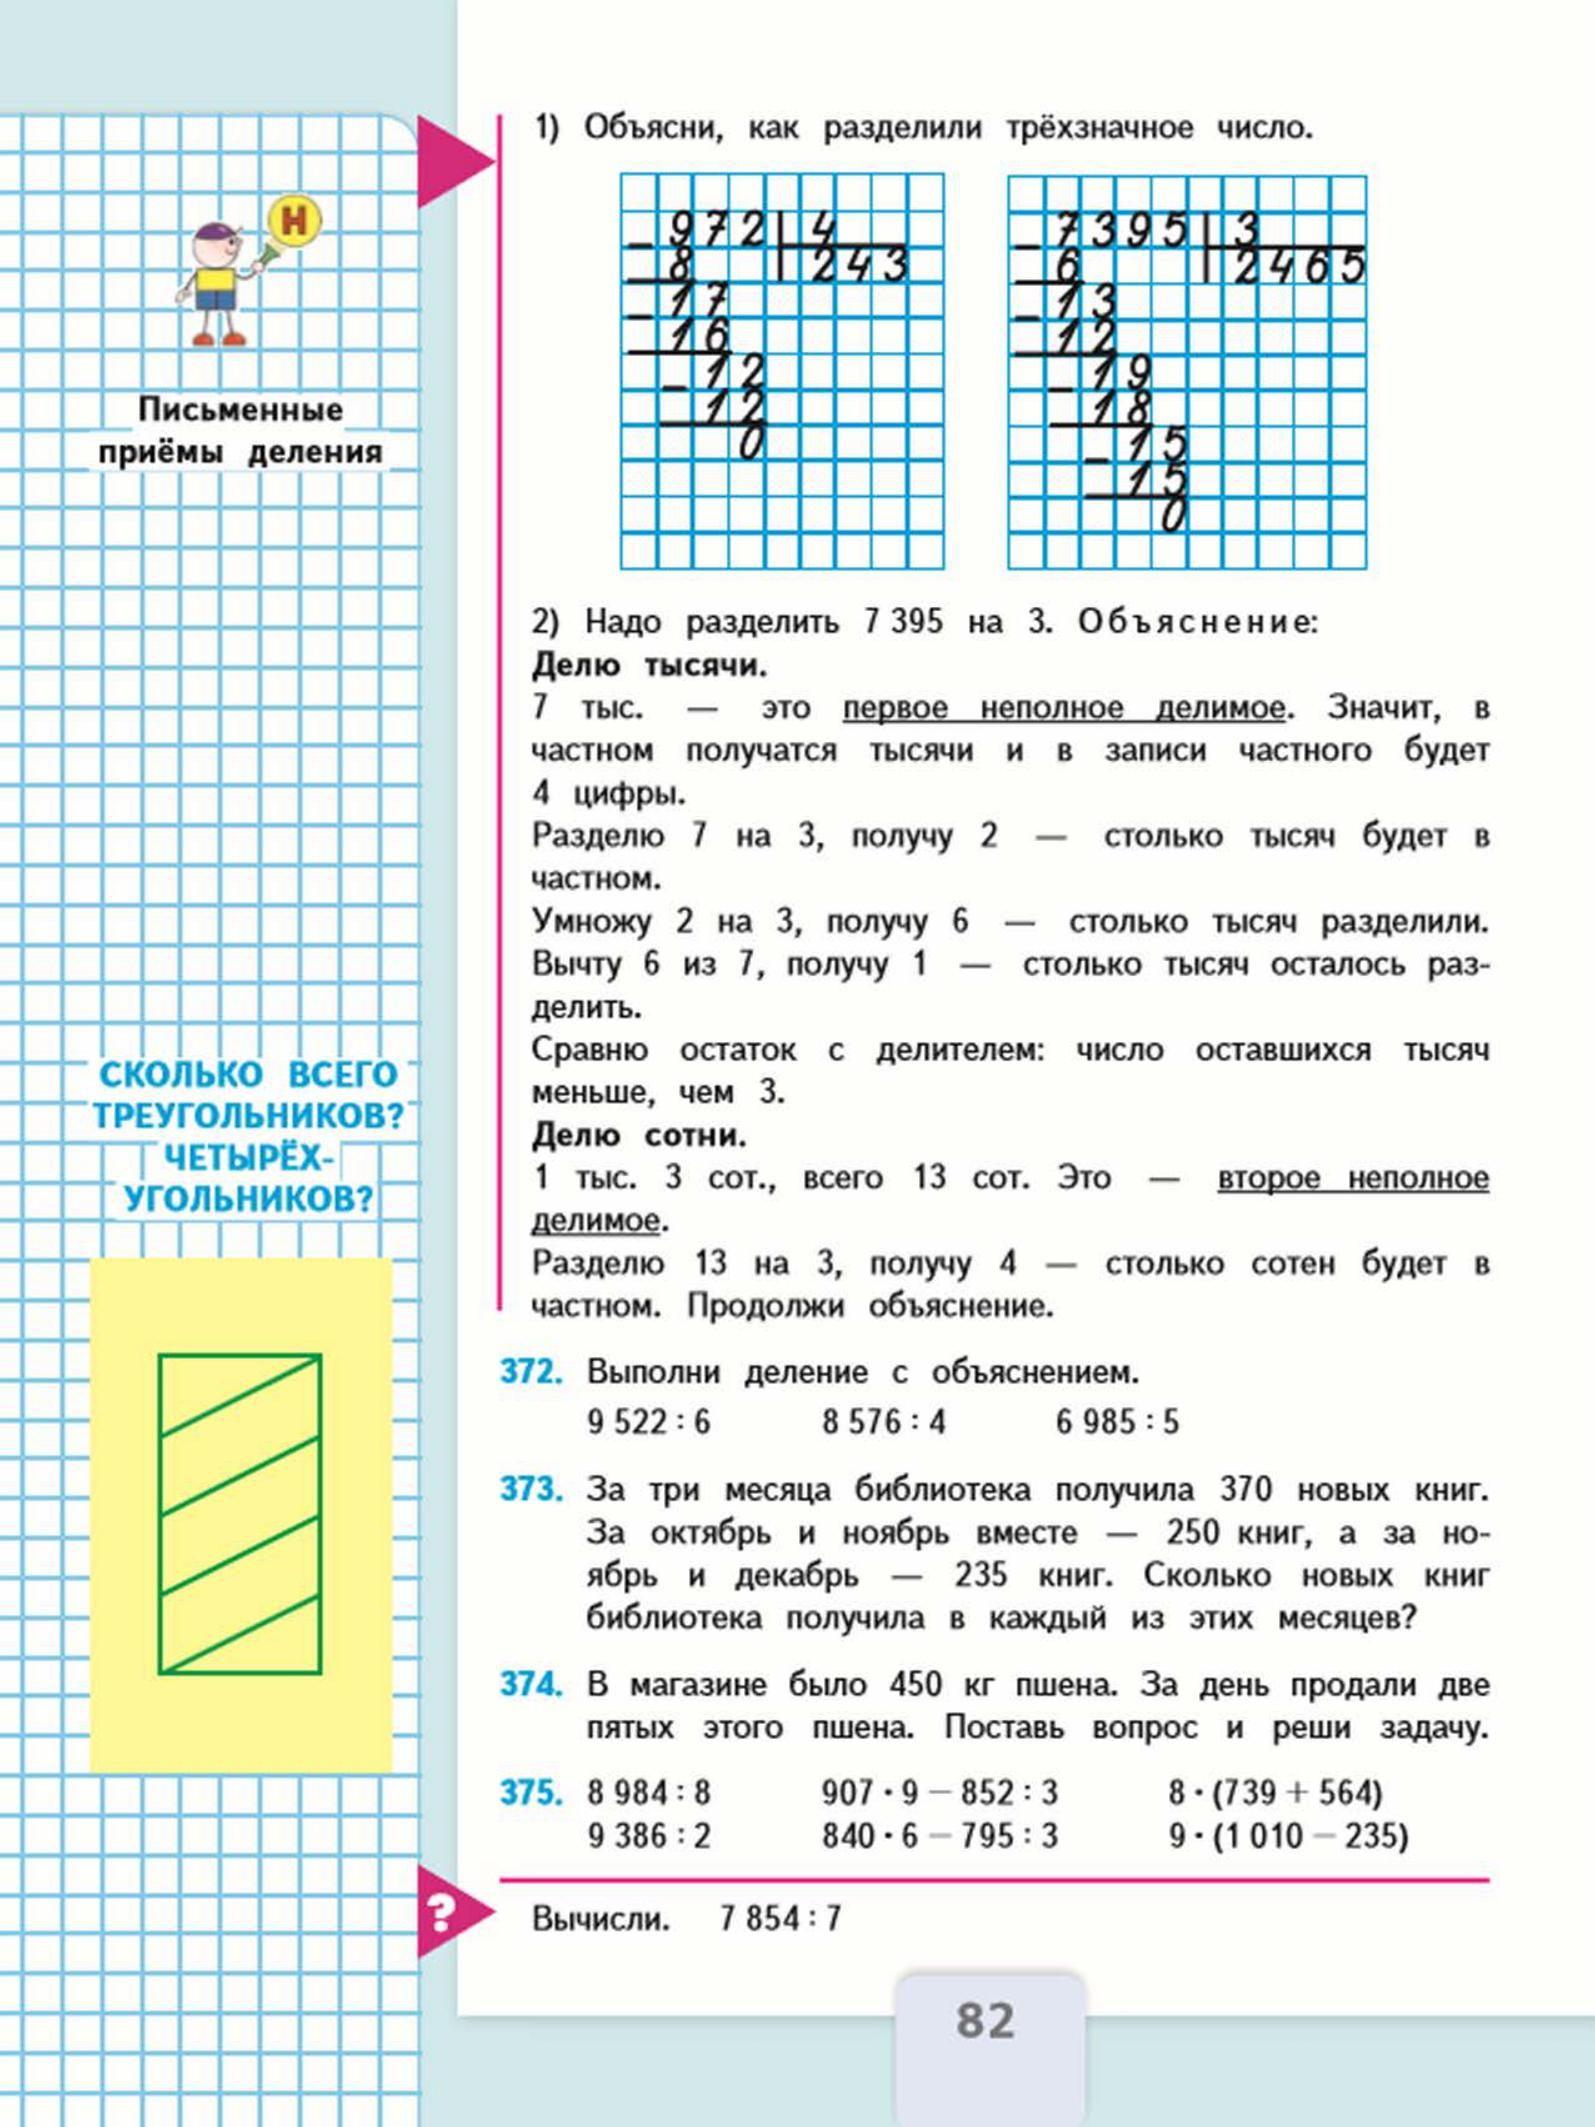 Кроссворд по истории 7 класс с ответами дмитриева